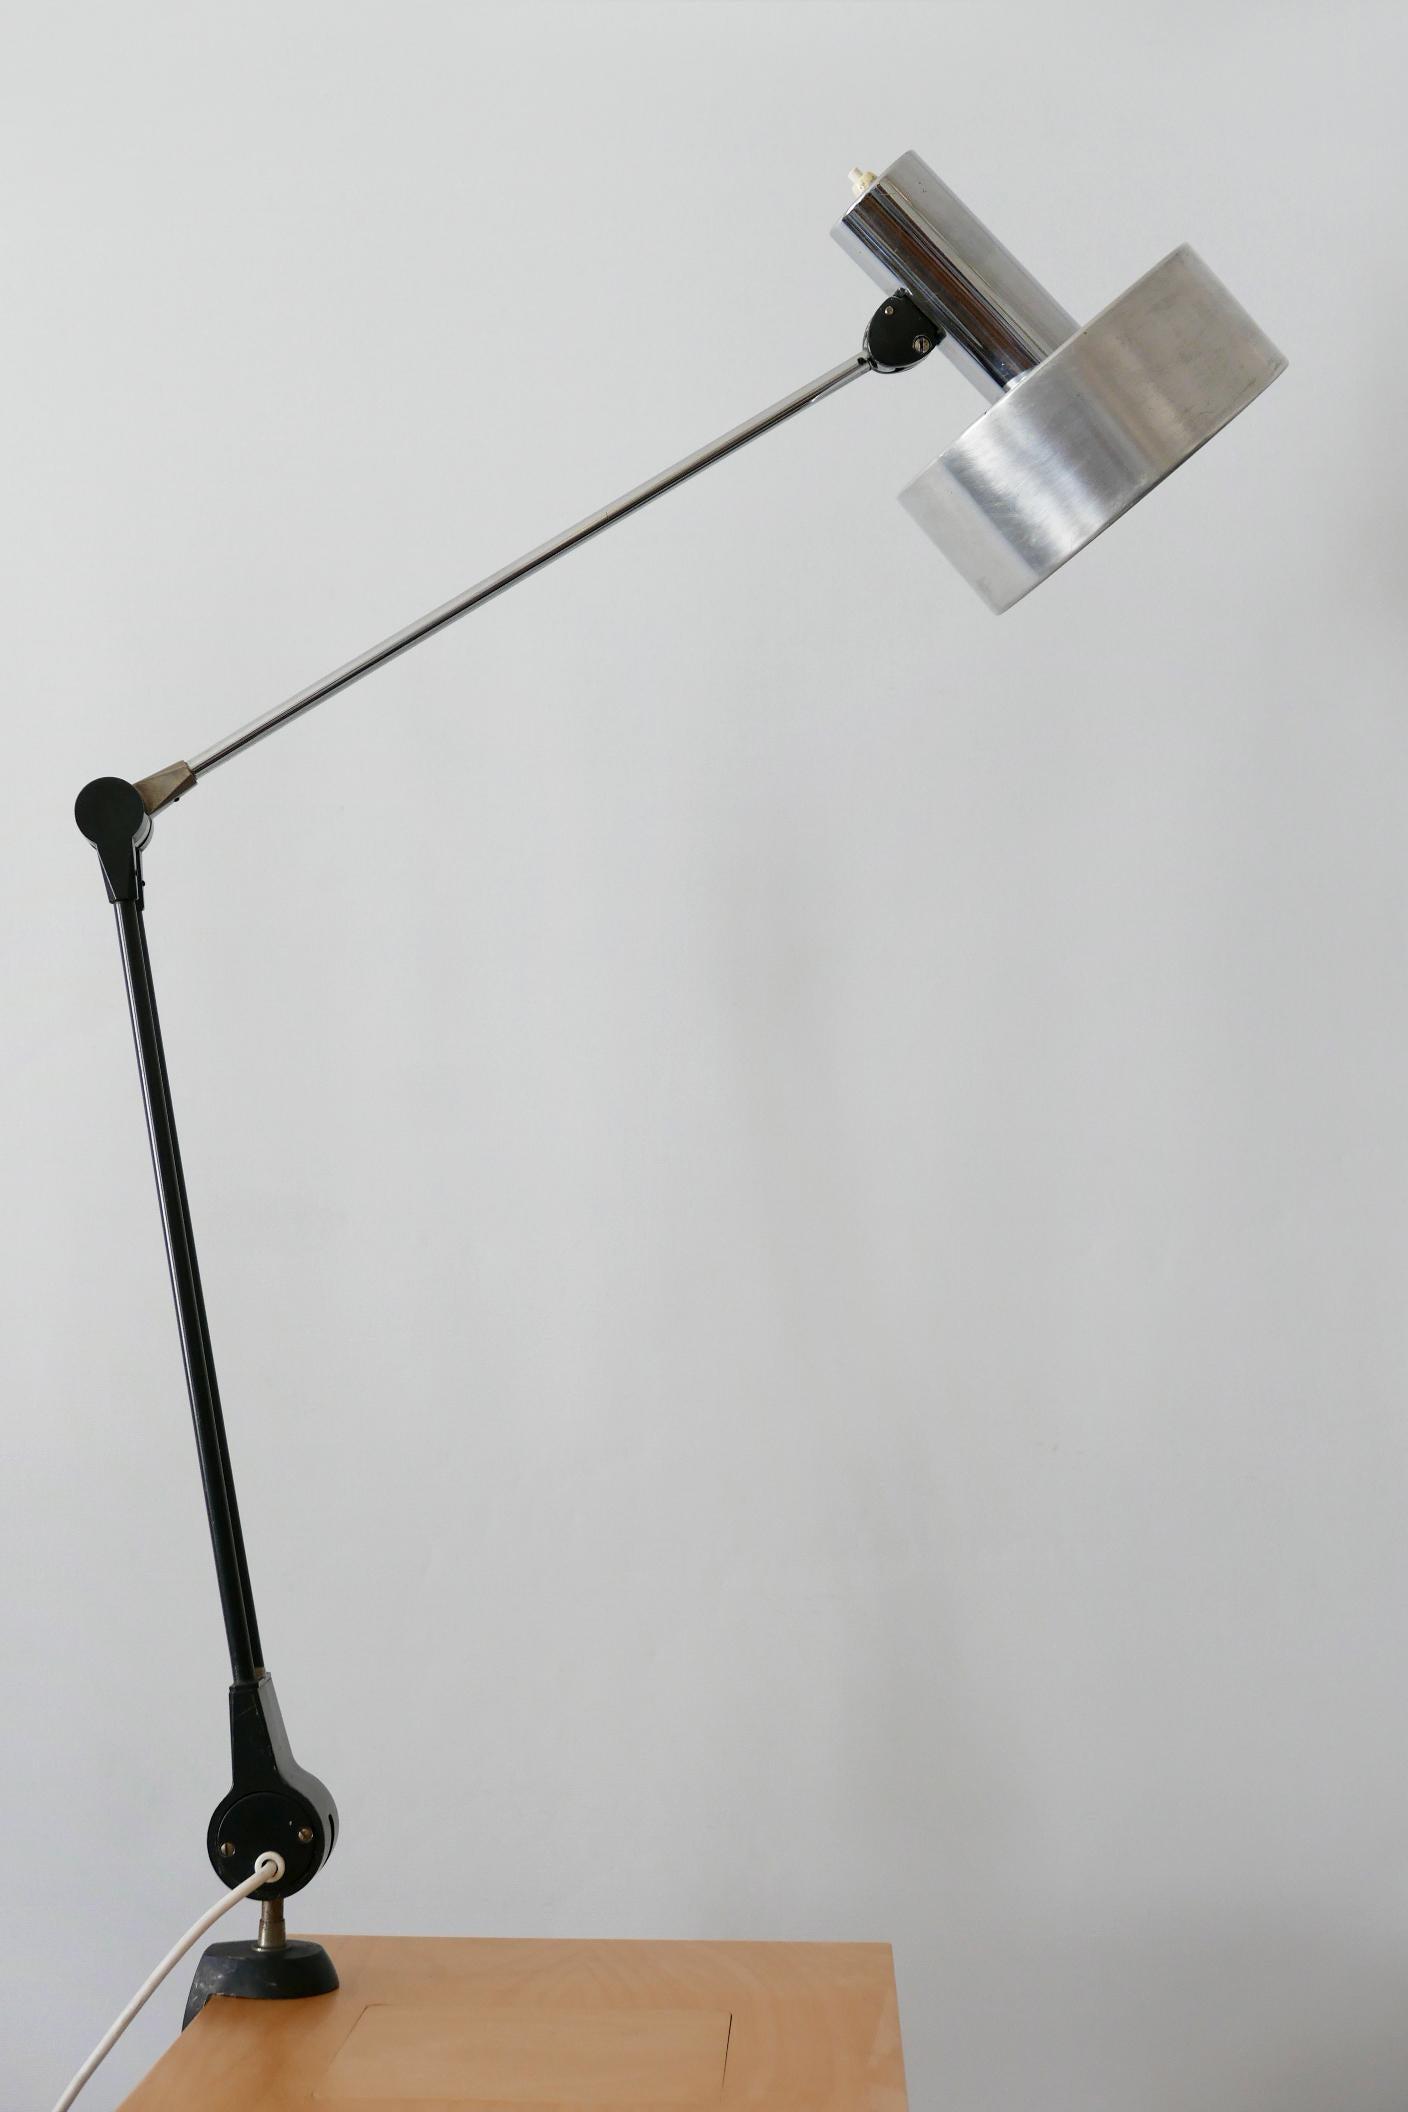 Image of: Mid Century Modern Task Lamp Or Clamp Table Light By Kaiser Leuchten 1970s For Sale At 1stdibs